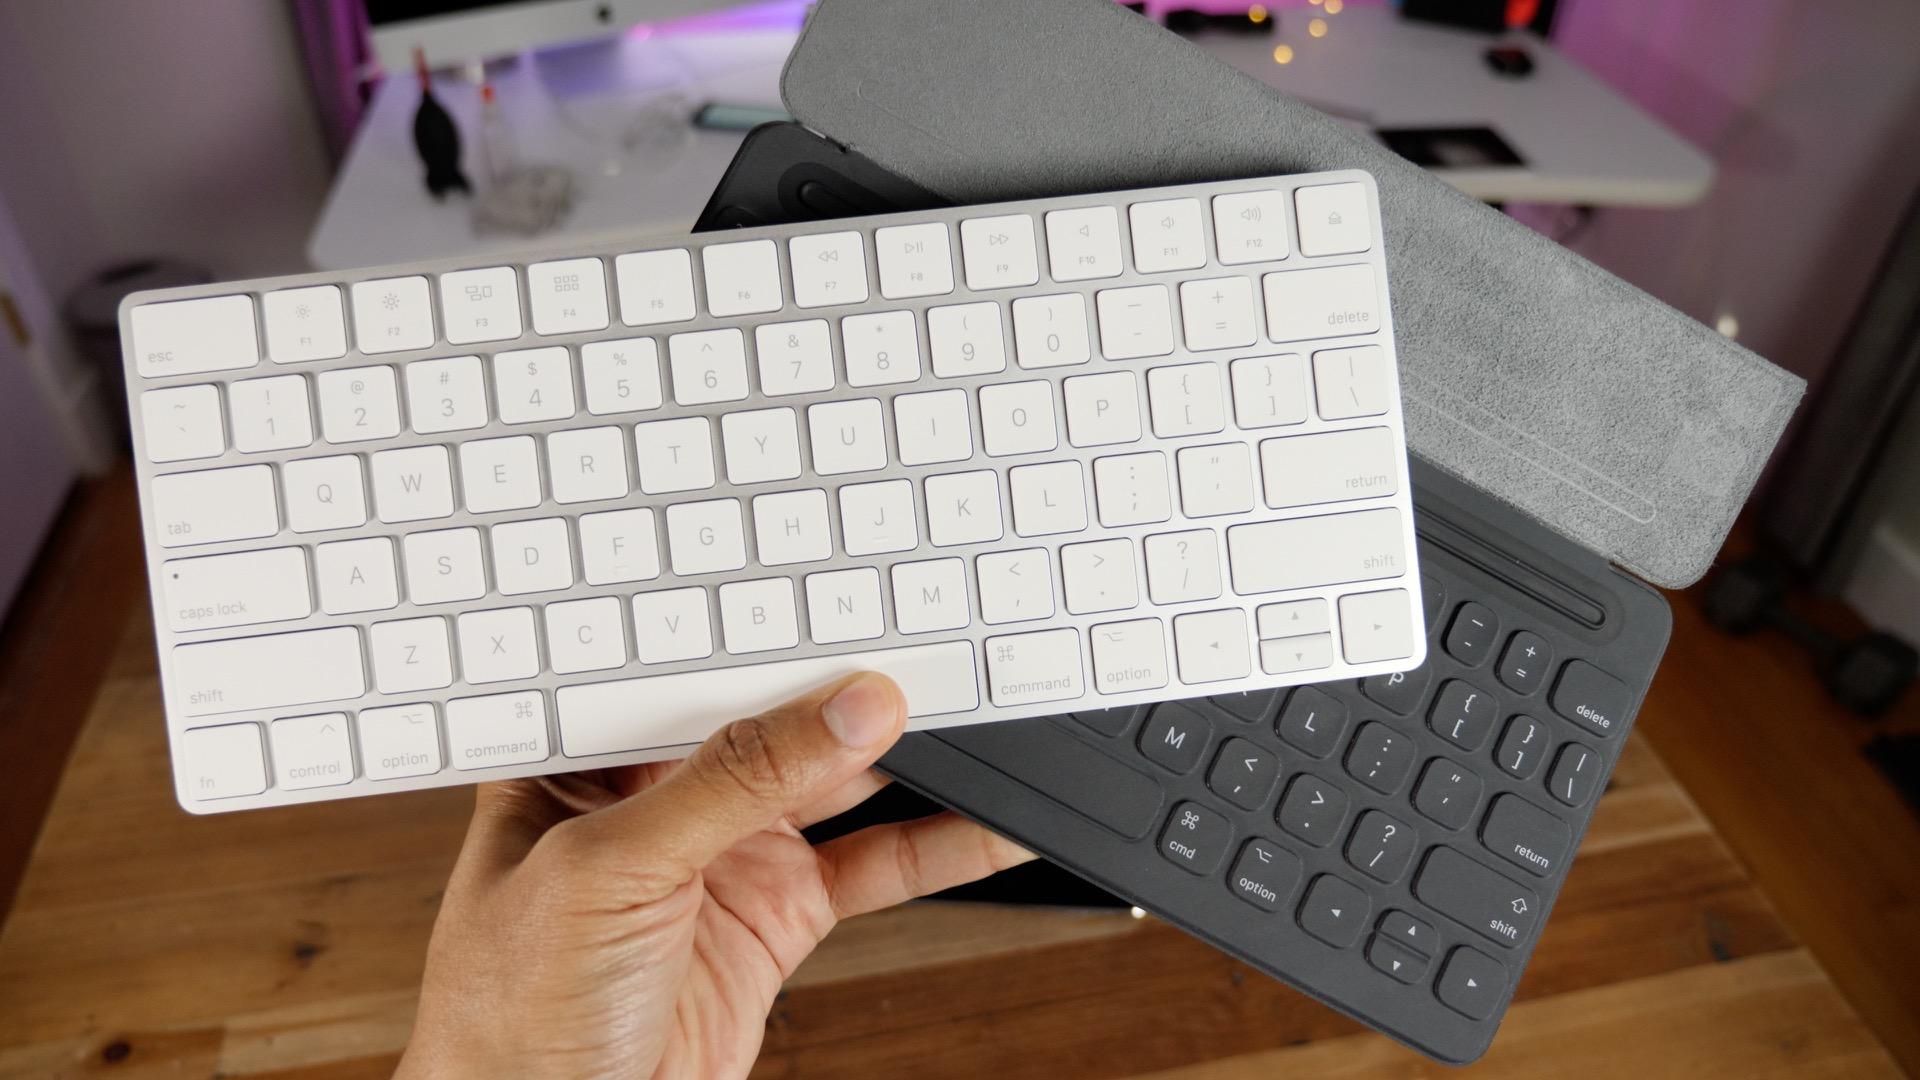 iPad Pro: Smart Keyboard vs Magic Keyboard - which one ...